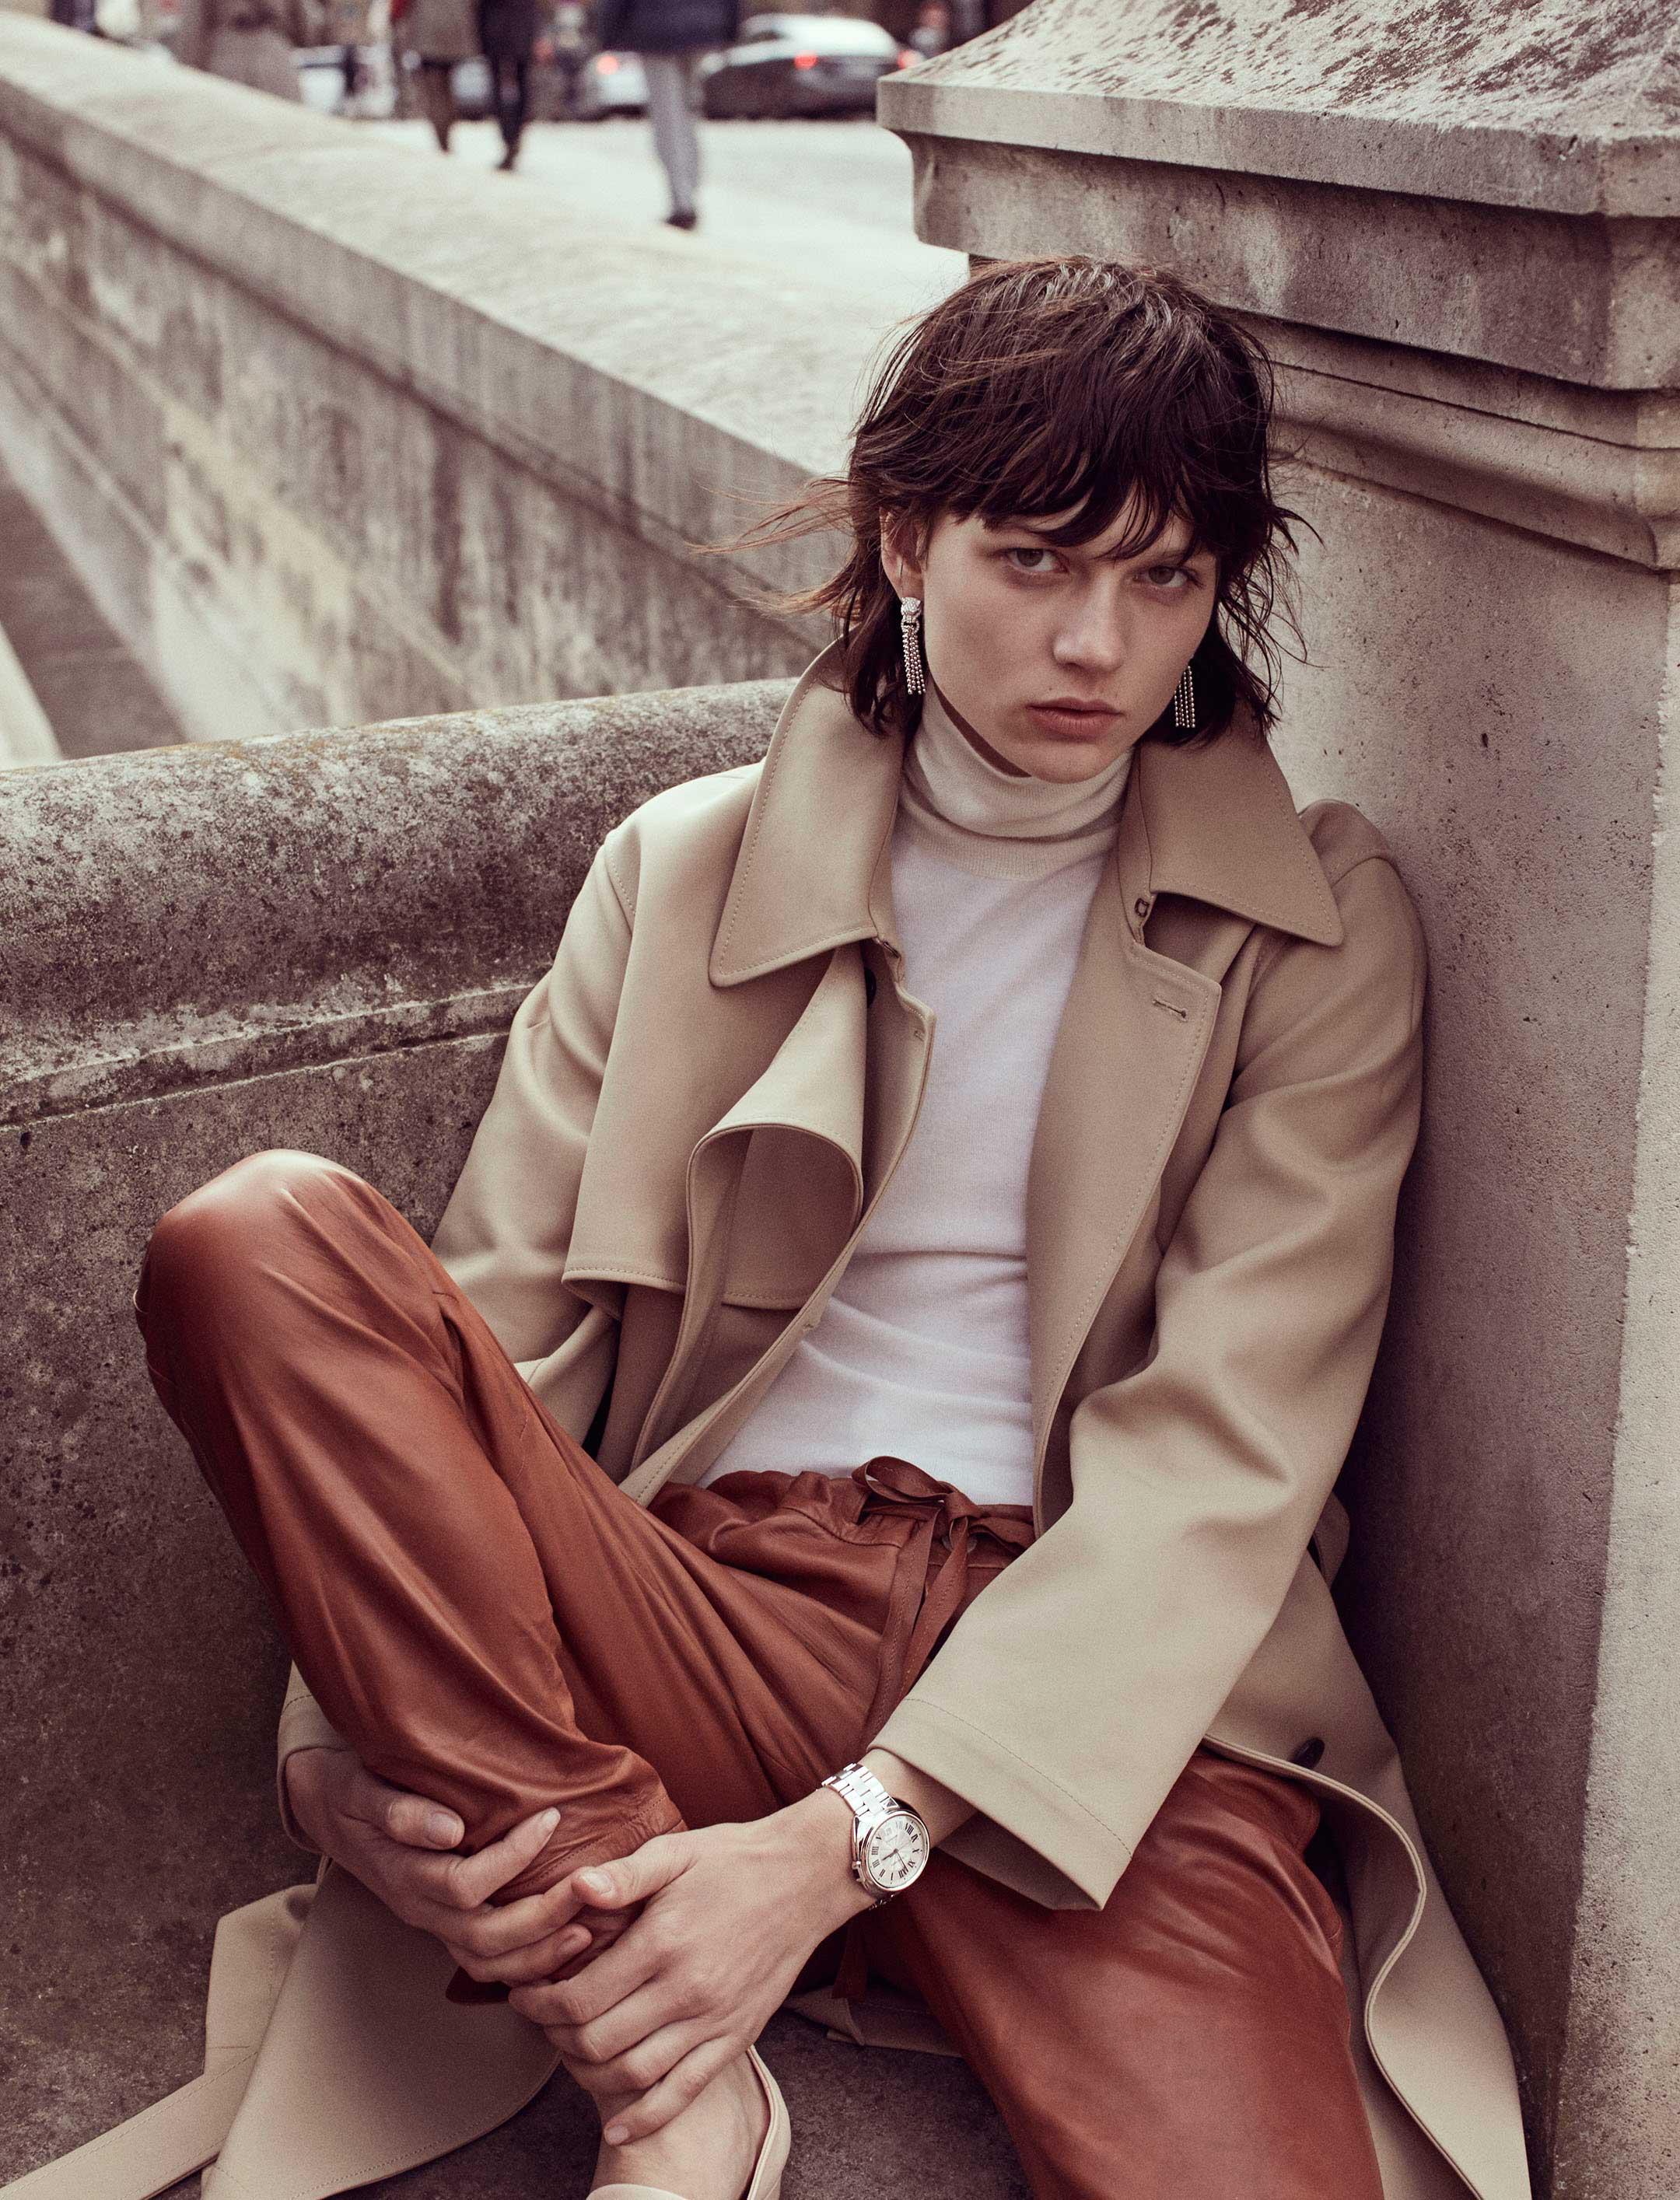 Tanya Jones for L'Express Styles (ph. Stefano Galuzzi)